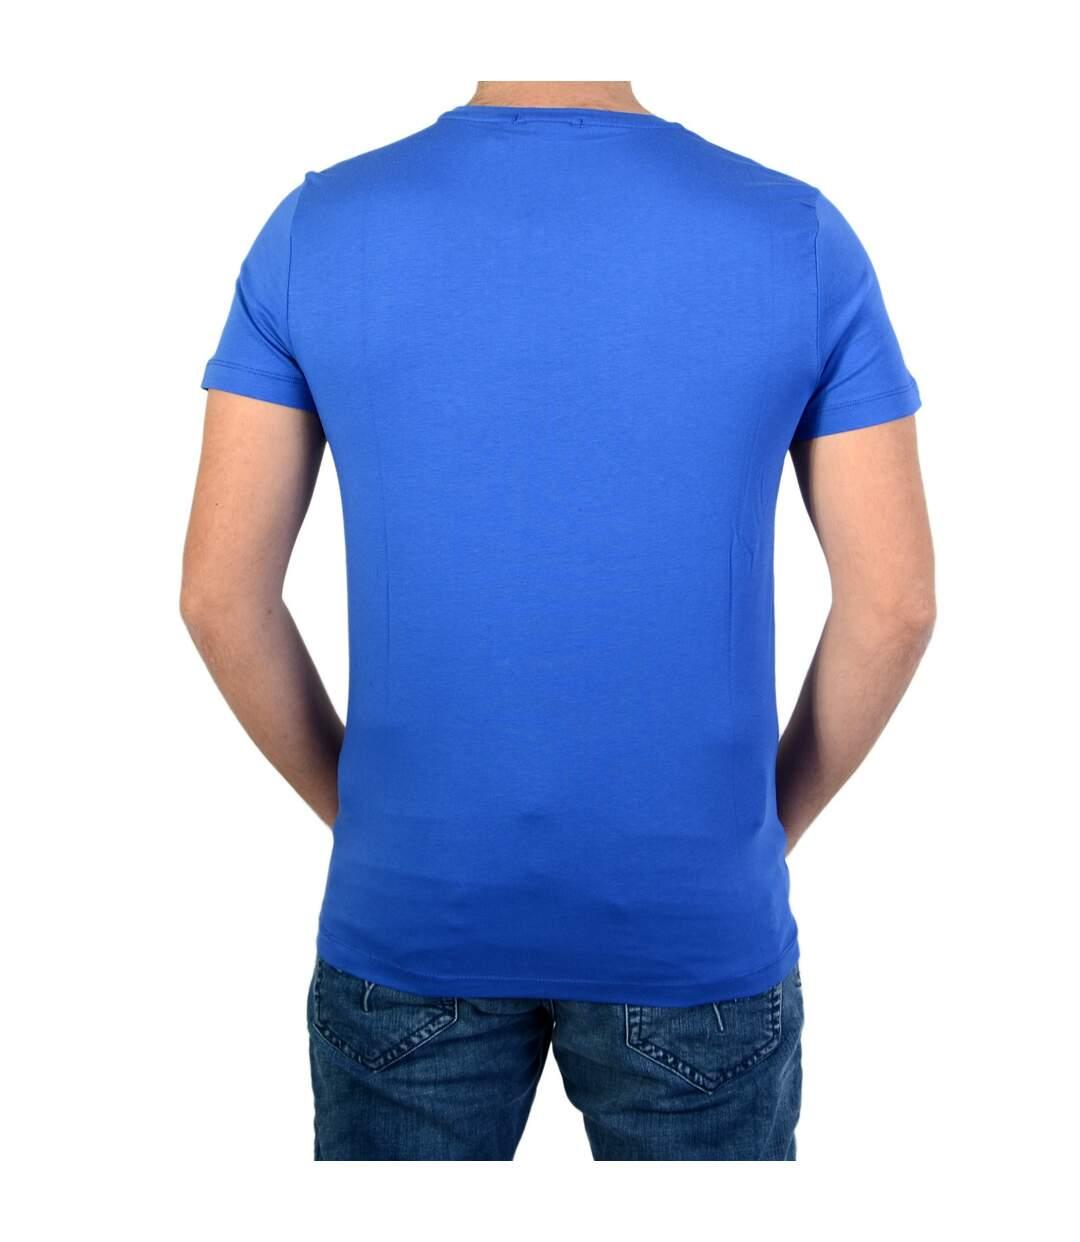 T-shirt Redskins Rafting 2 Calder Dazzling Blue